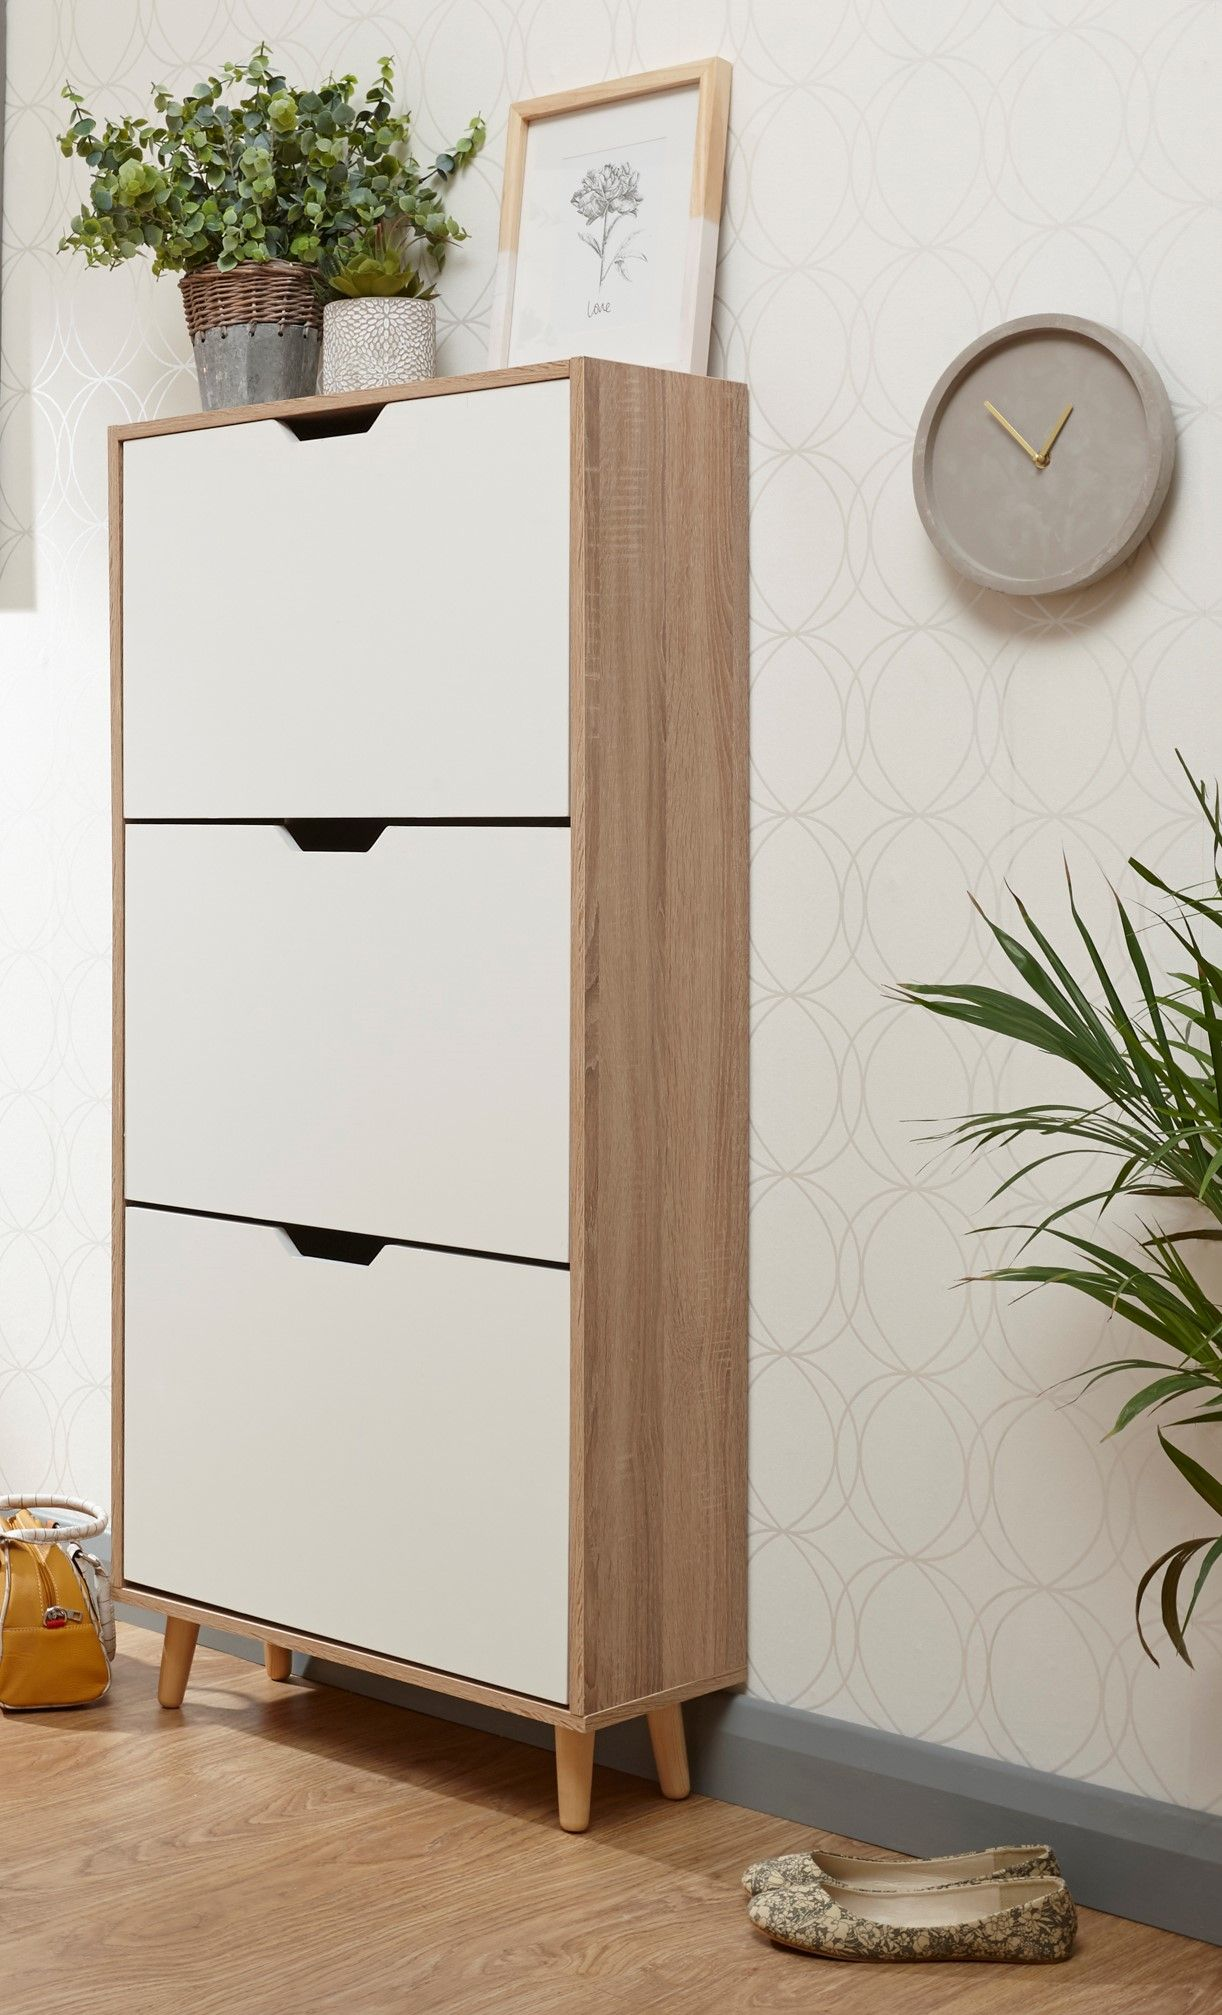 6 Pair Shoe Storage Cabinet Shoe Storage Cabinet Home Decor Shoe Storage